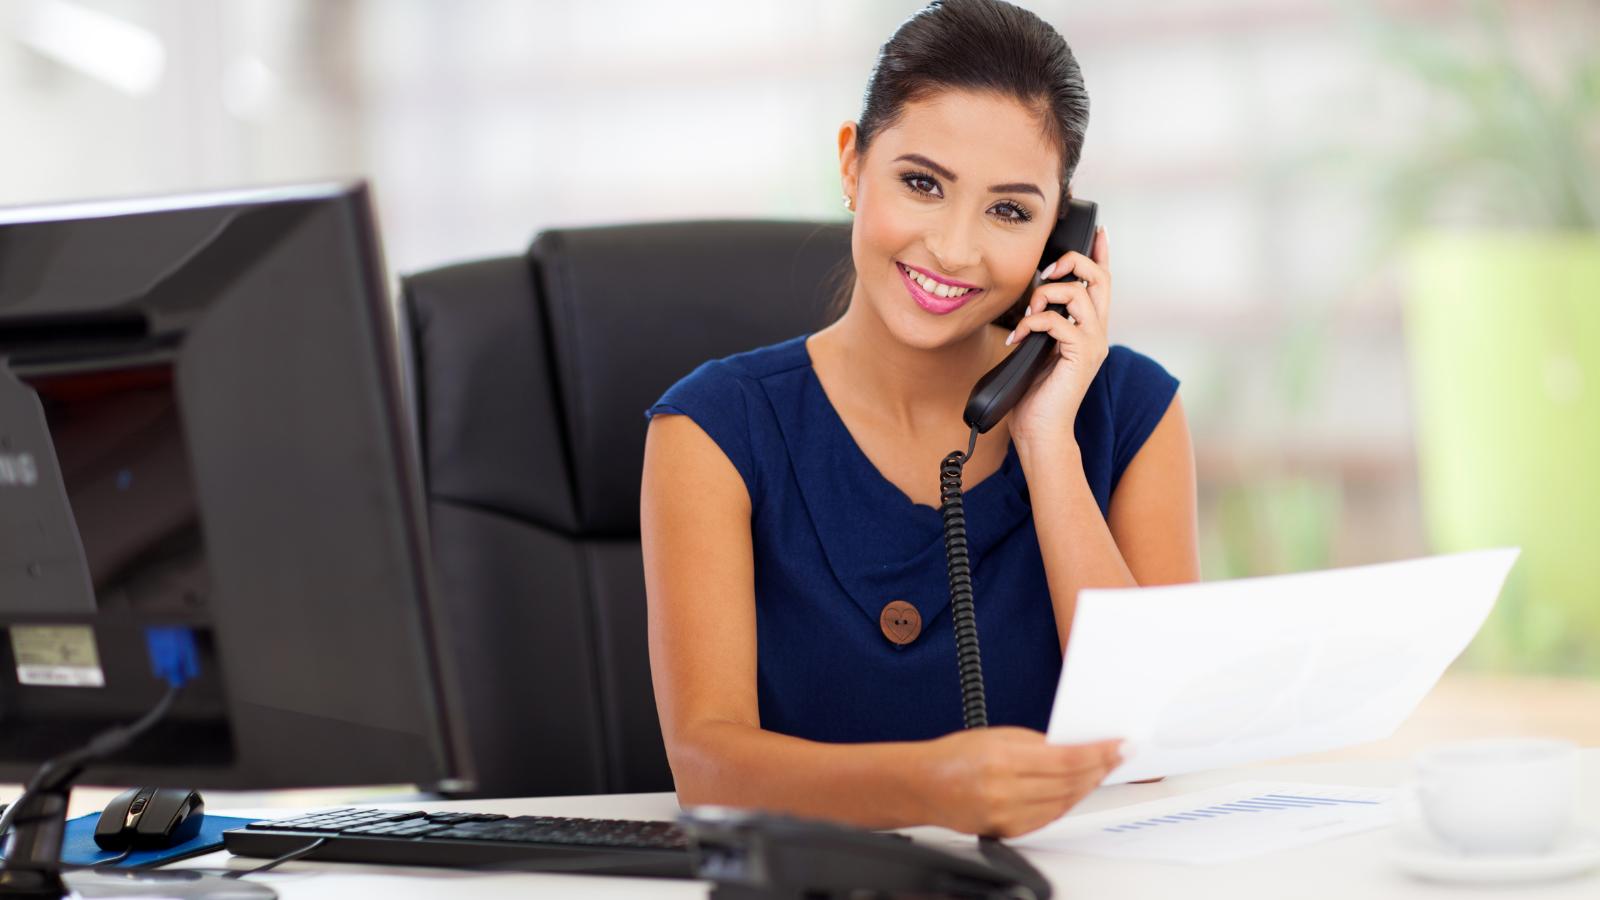 woman using good telephone etiquette